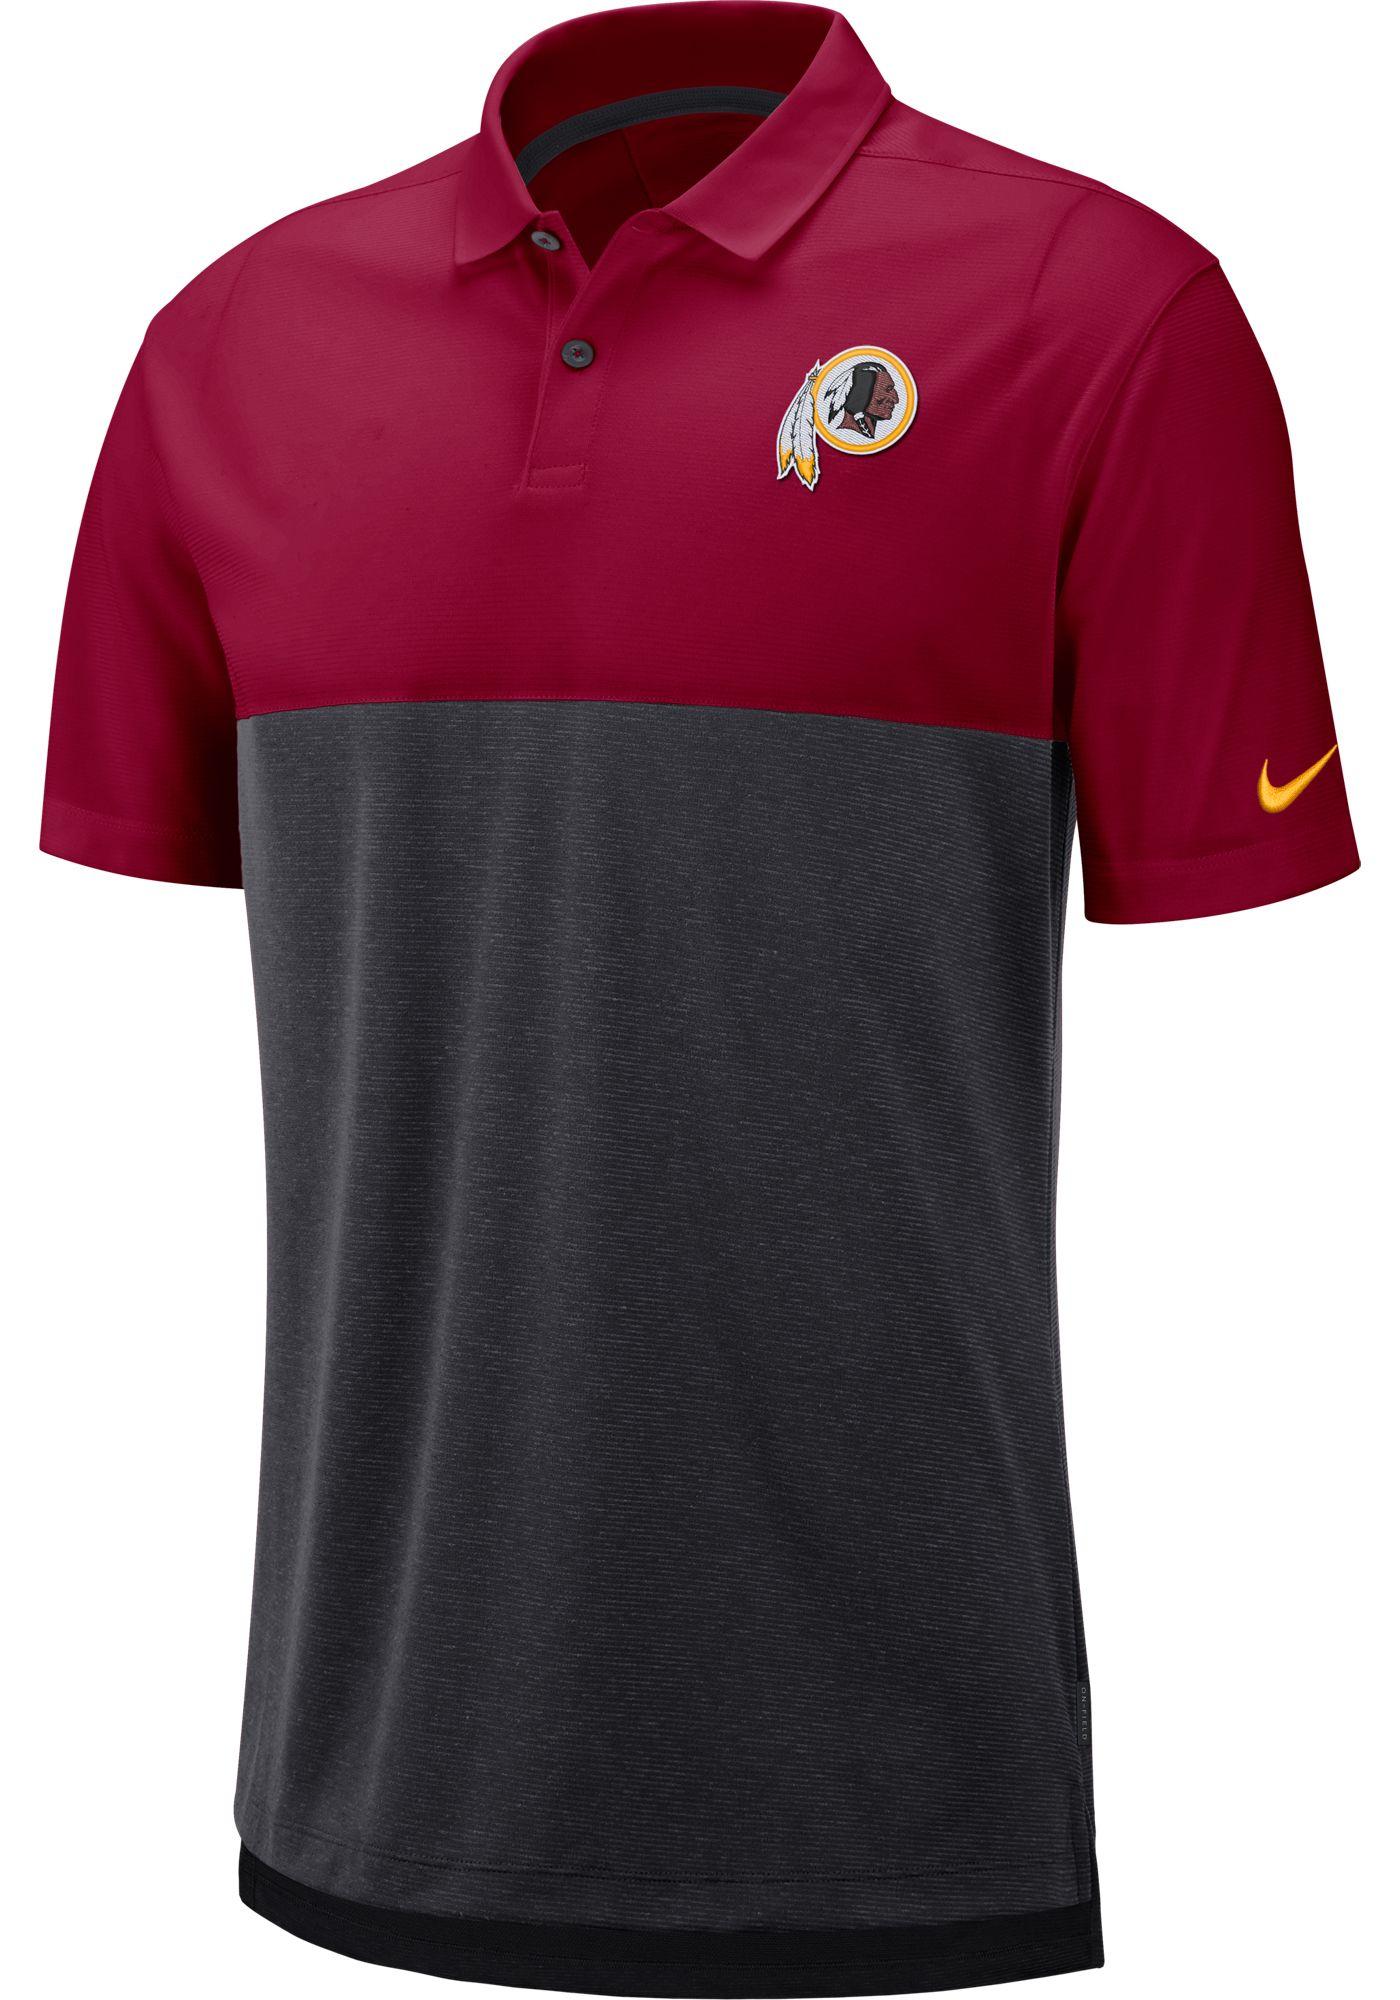 Nike Men's Washington Redskins Sideline Early Season Red Polo